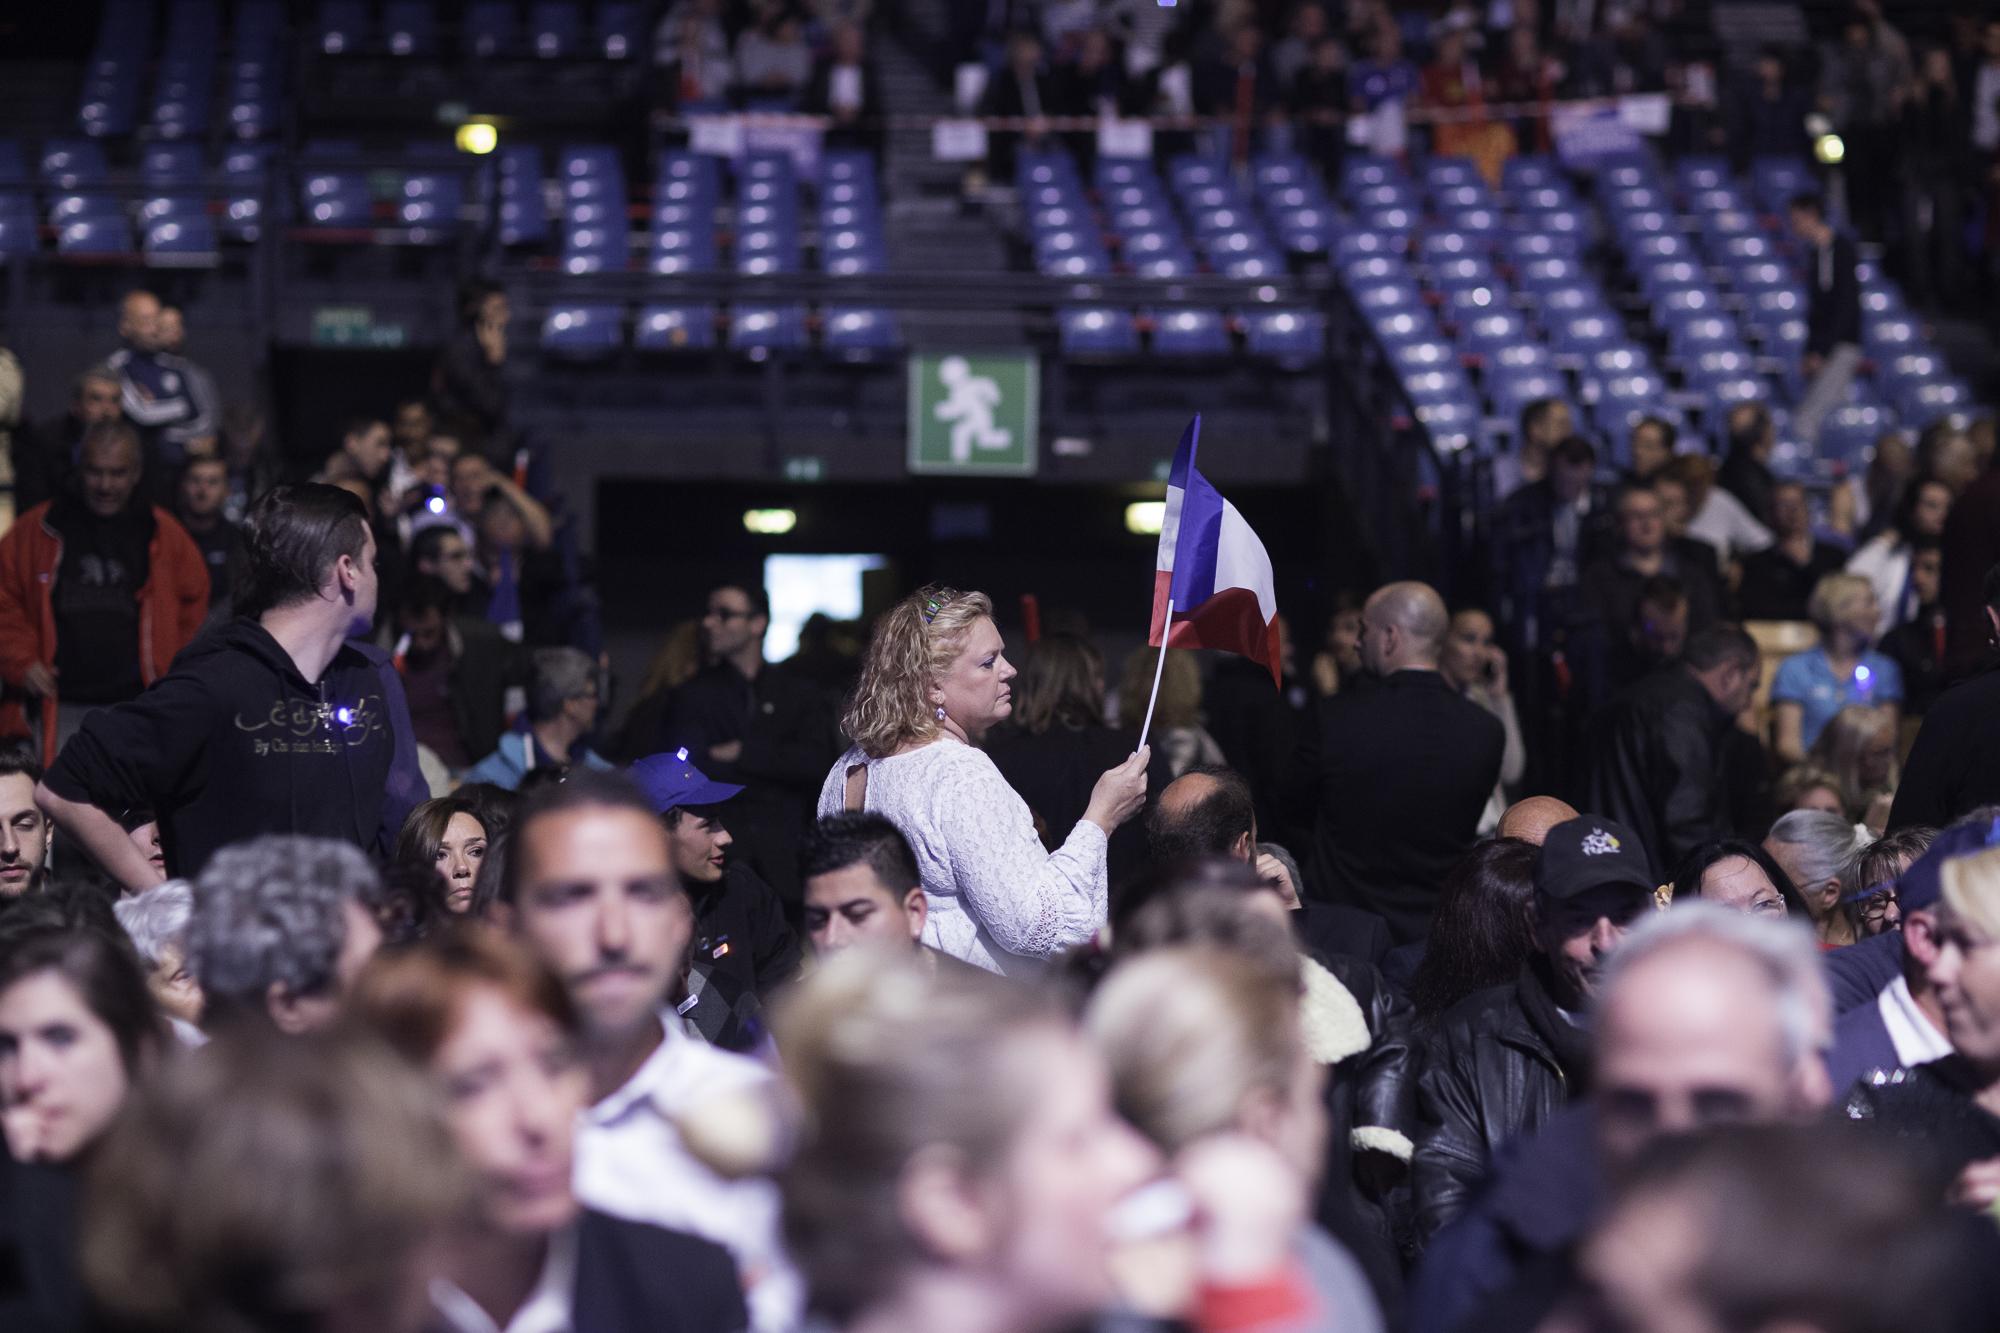 (c) Priscilla Stanley - Presidentielles 2017 Nice5